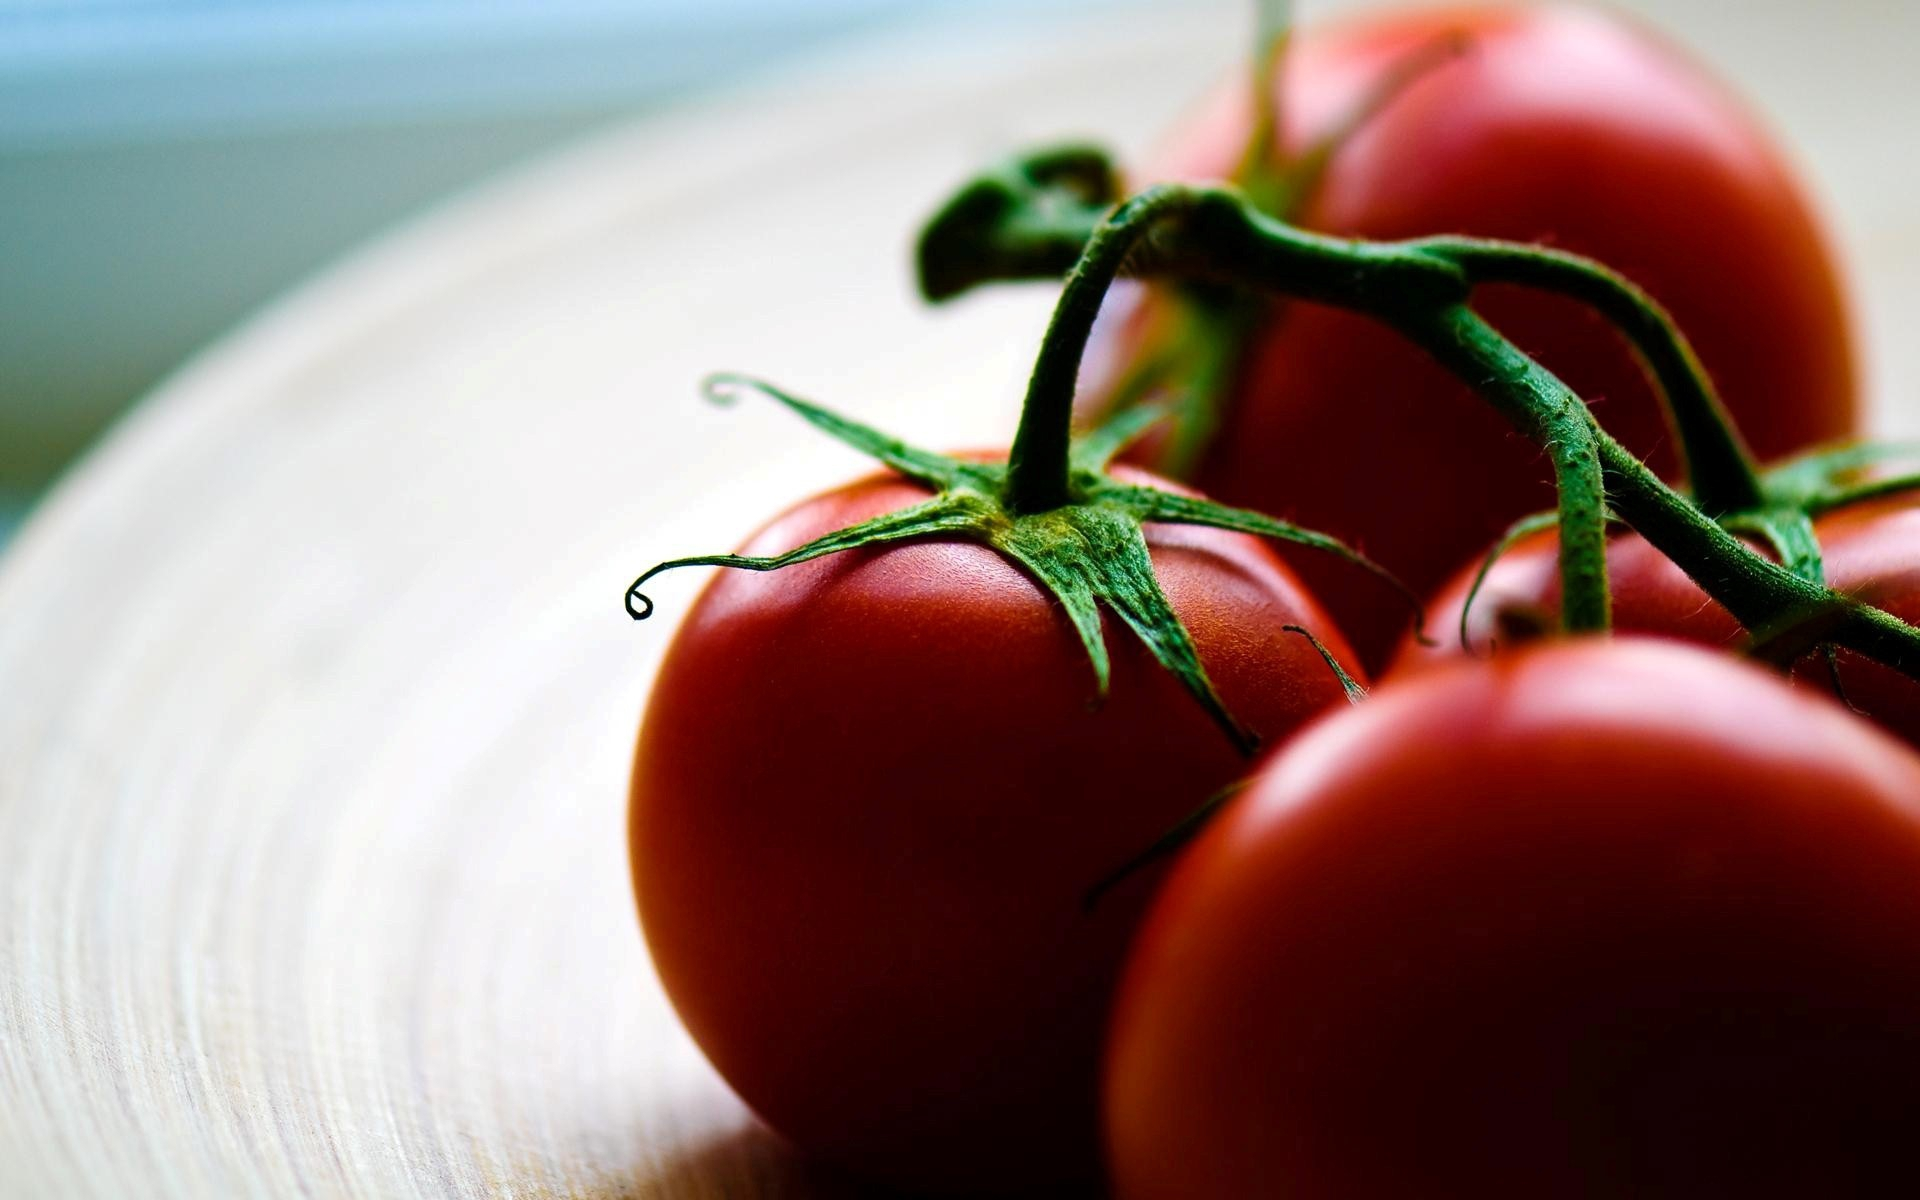 Tomato Free Images